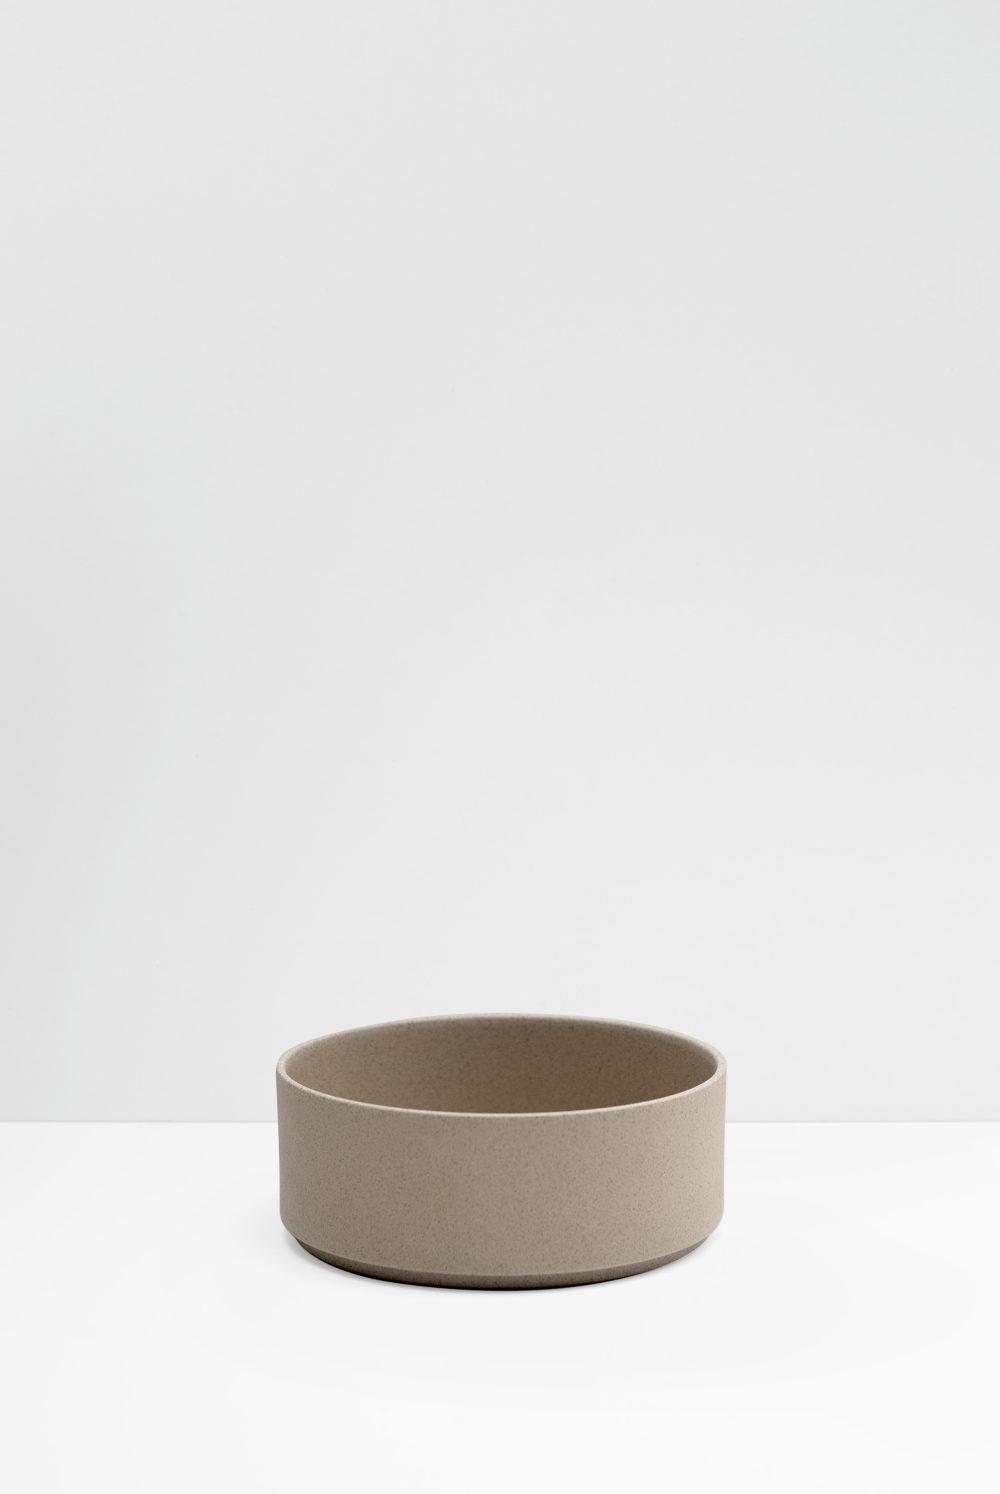 Hasami Porcelain bowl in natural matte